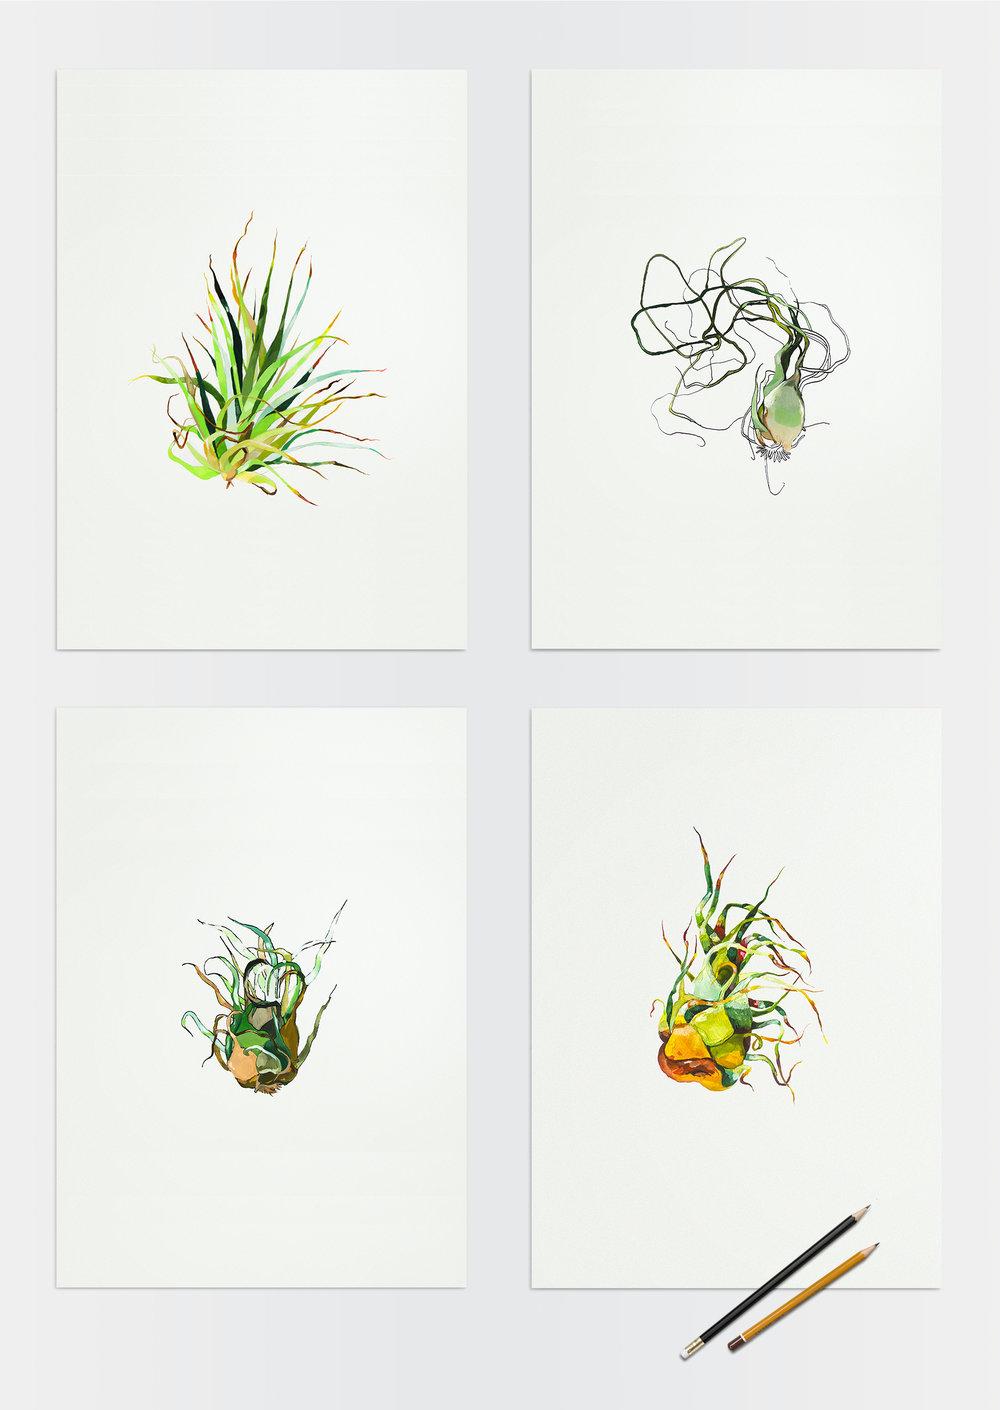 Refonte-illu-plantes.jpg